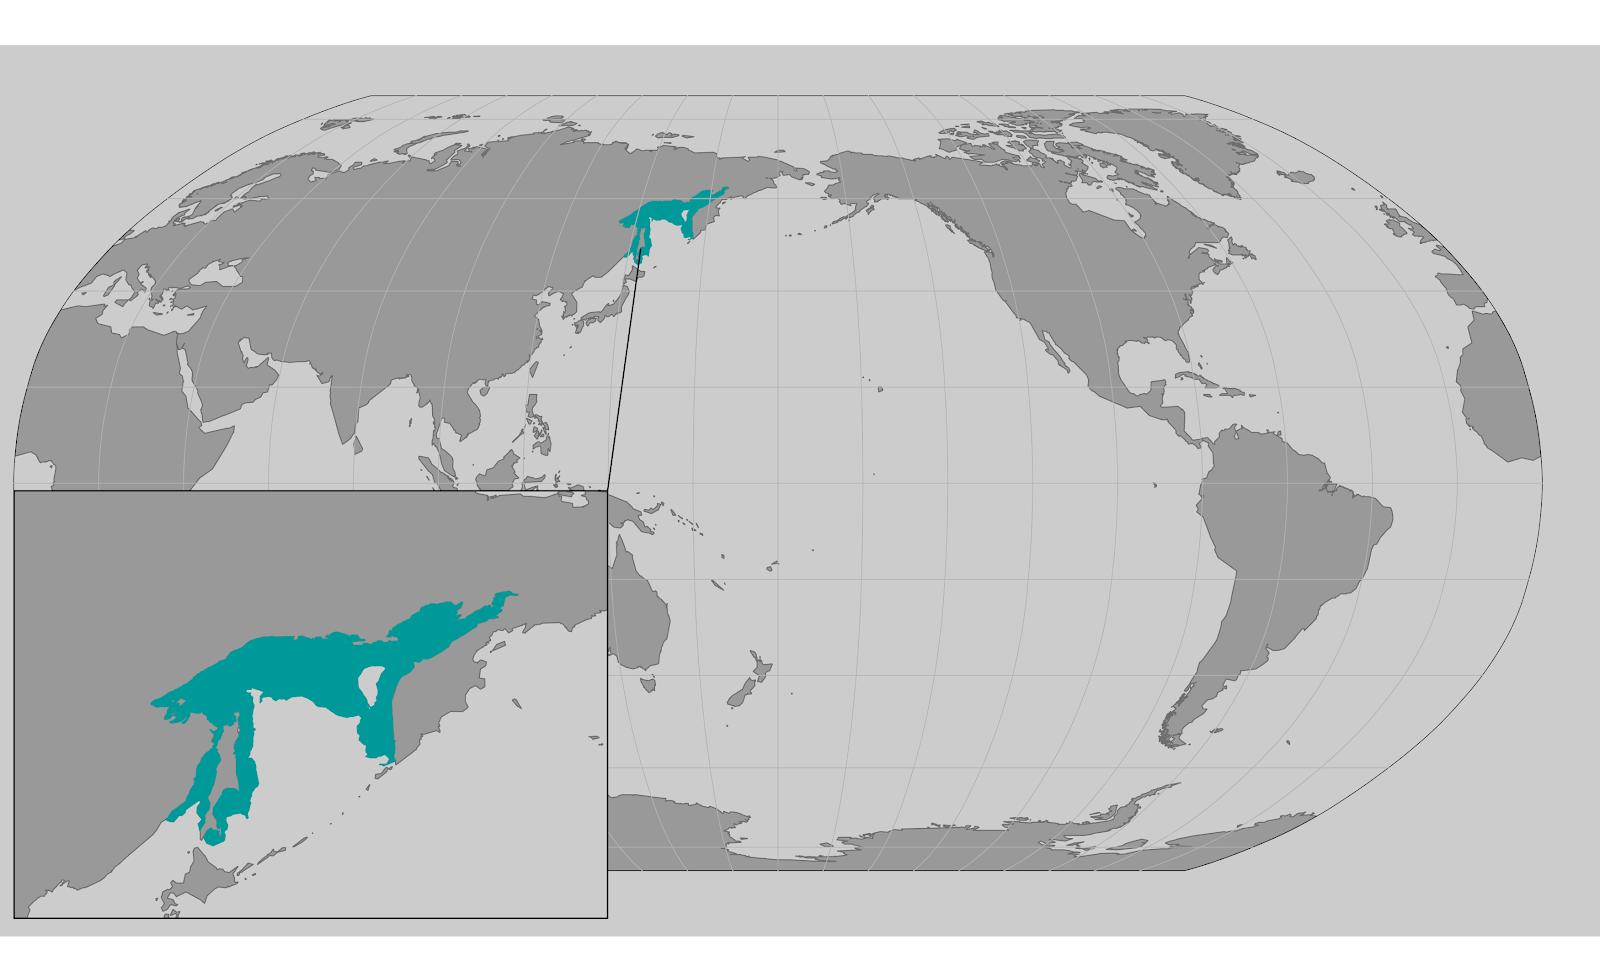 World map providing approximate representation of the Okhotsk DPS of bearded seal's range